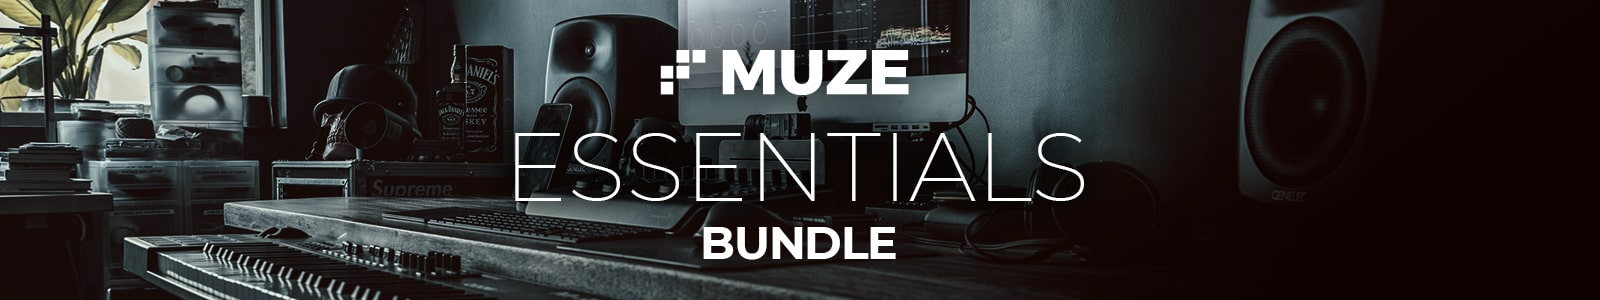 MUZE Essentials Bundle